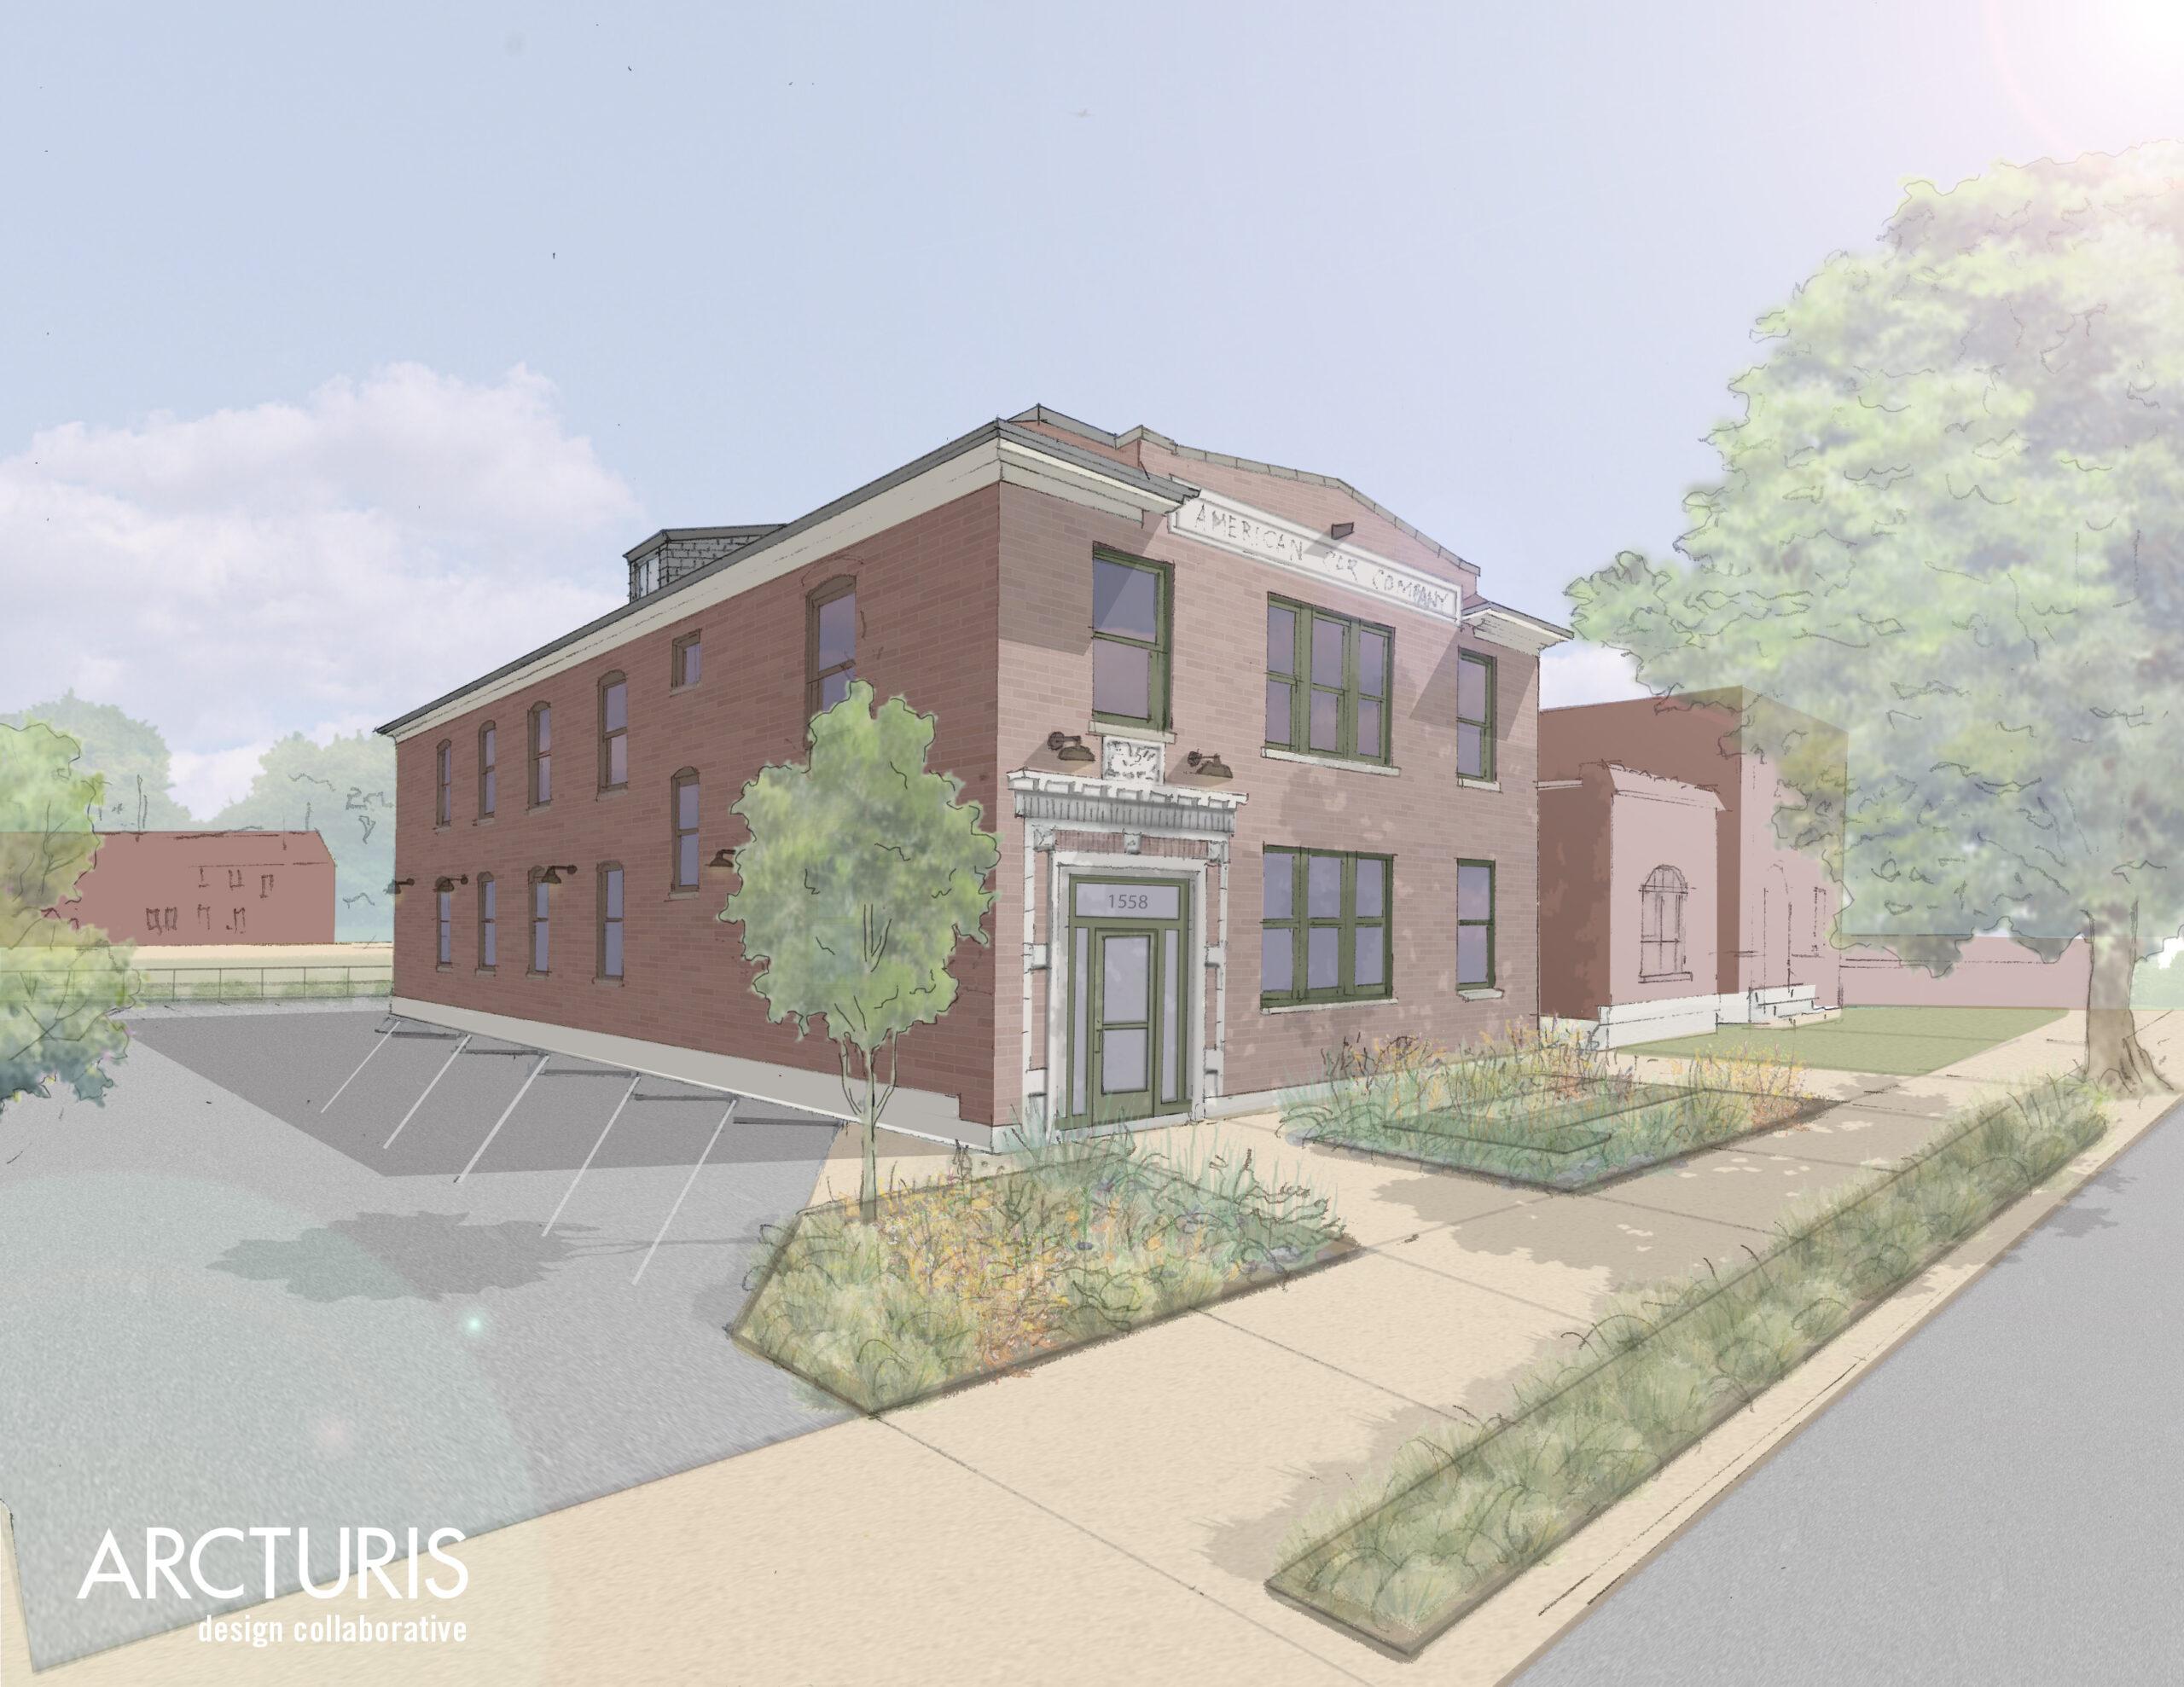 GadellNet To Renovate American Car Company Office Building On Vandeventer